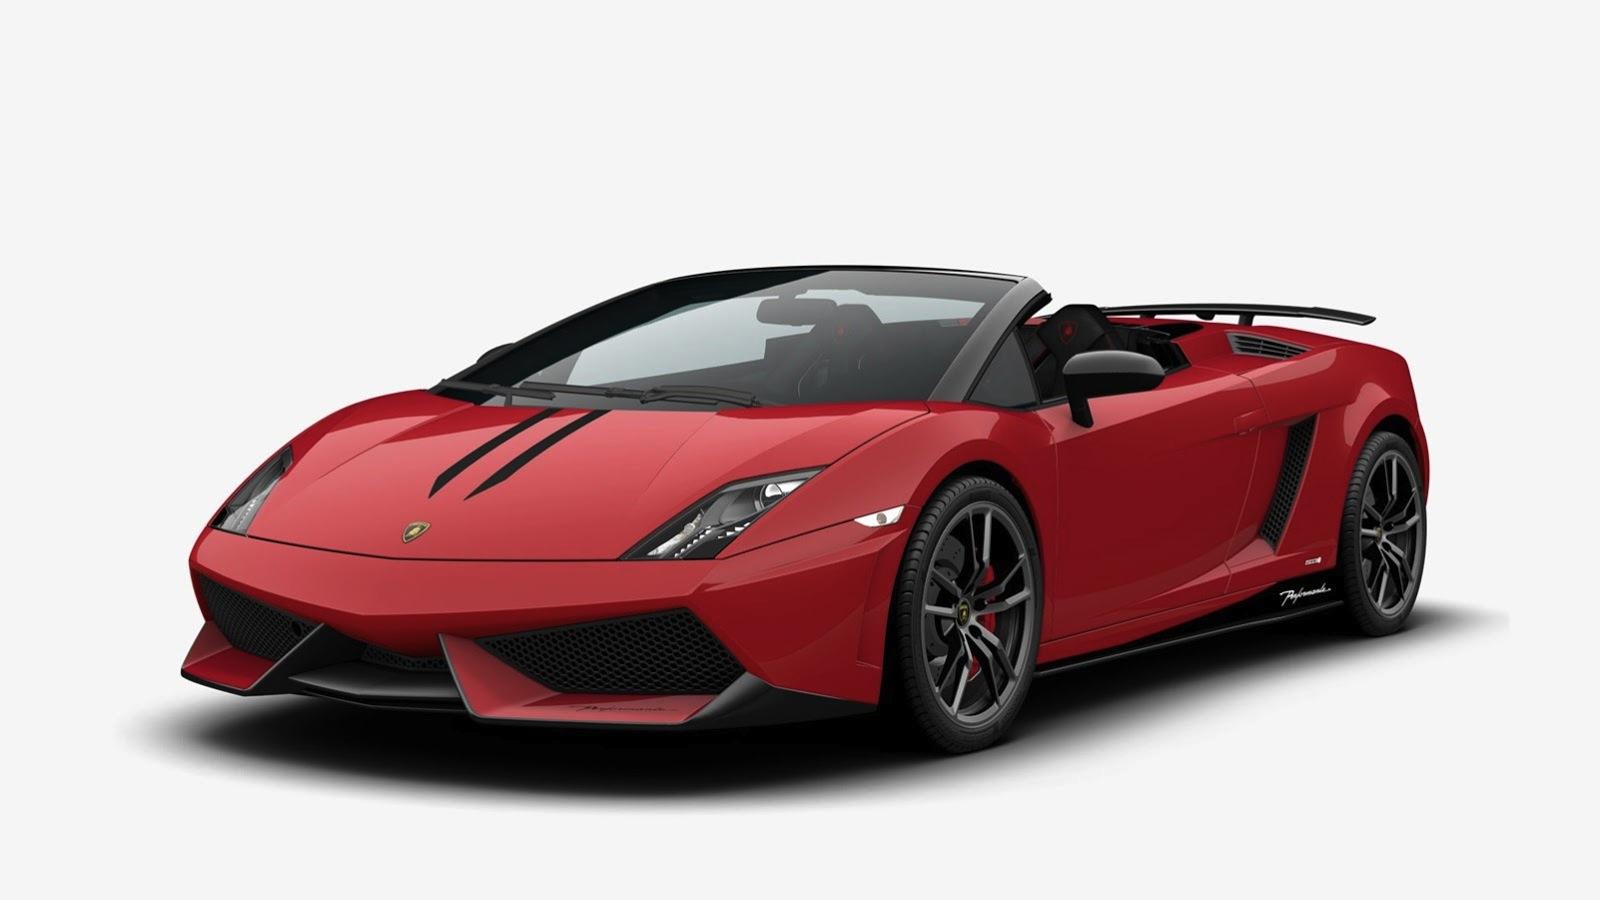 Luxury Lamborghini Cars Lamborghini Sesto Elemento 2013